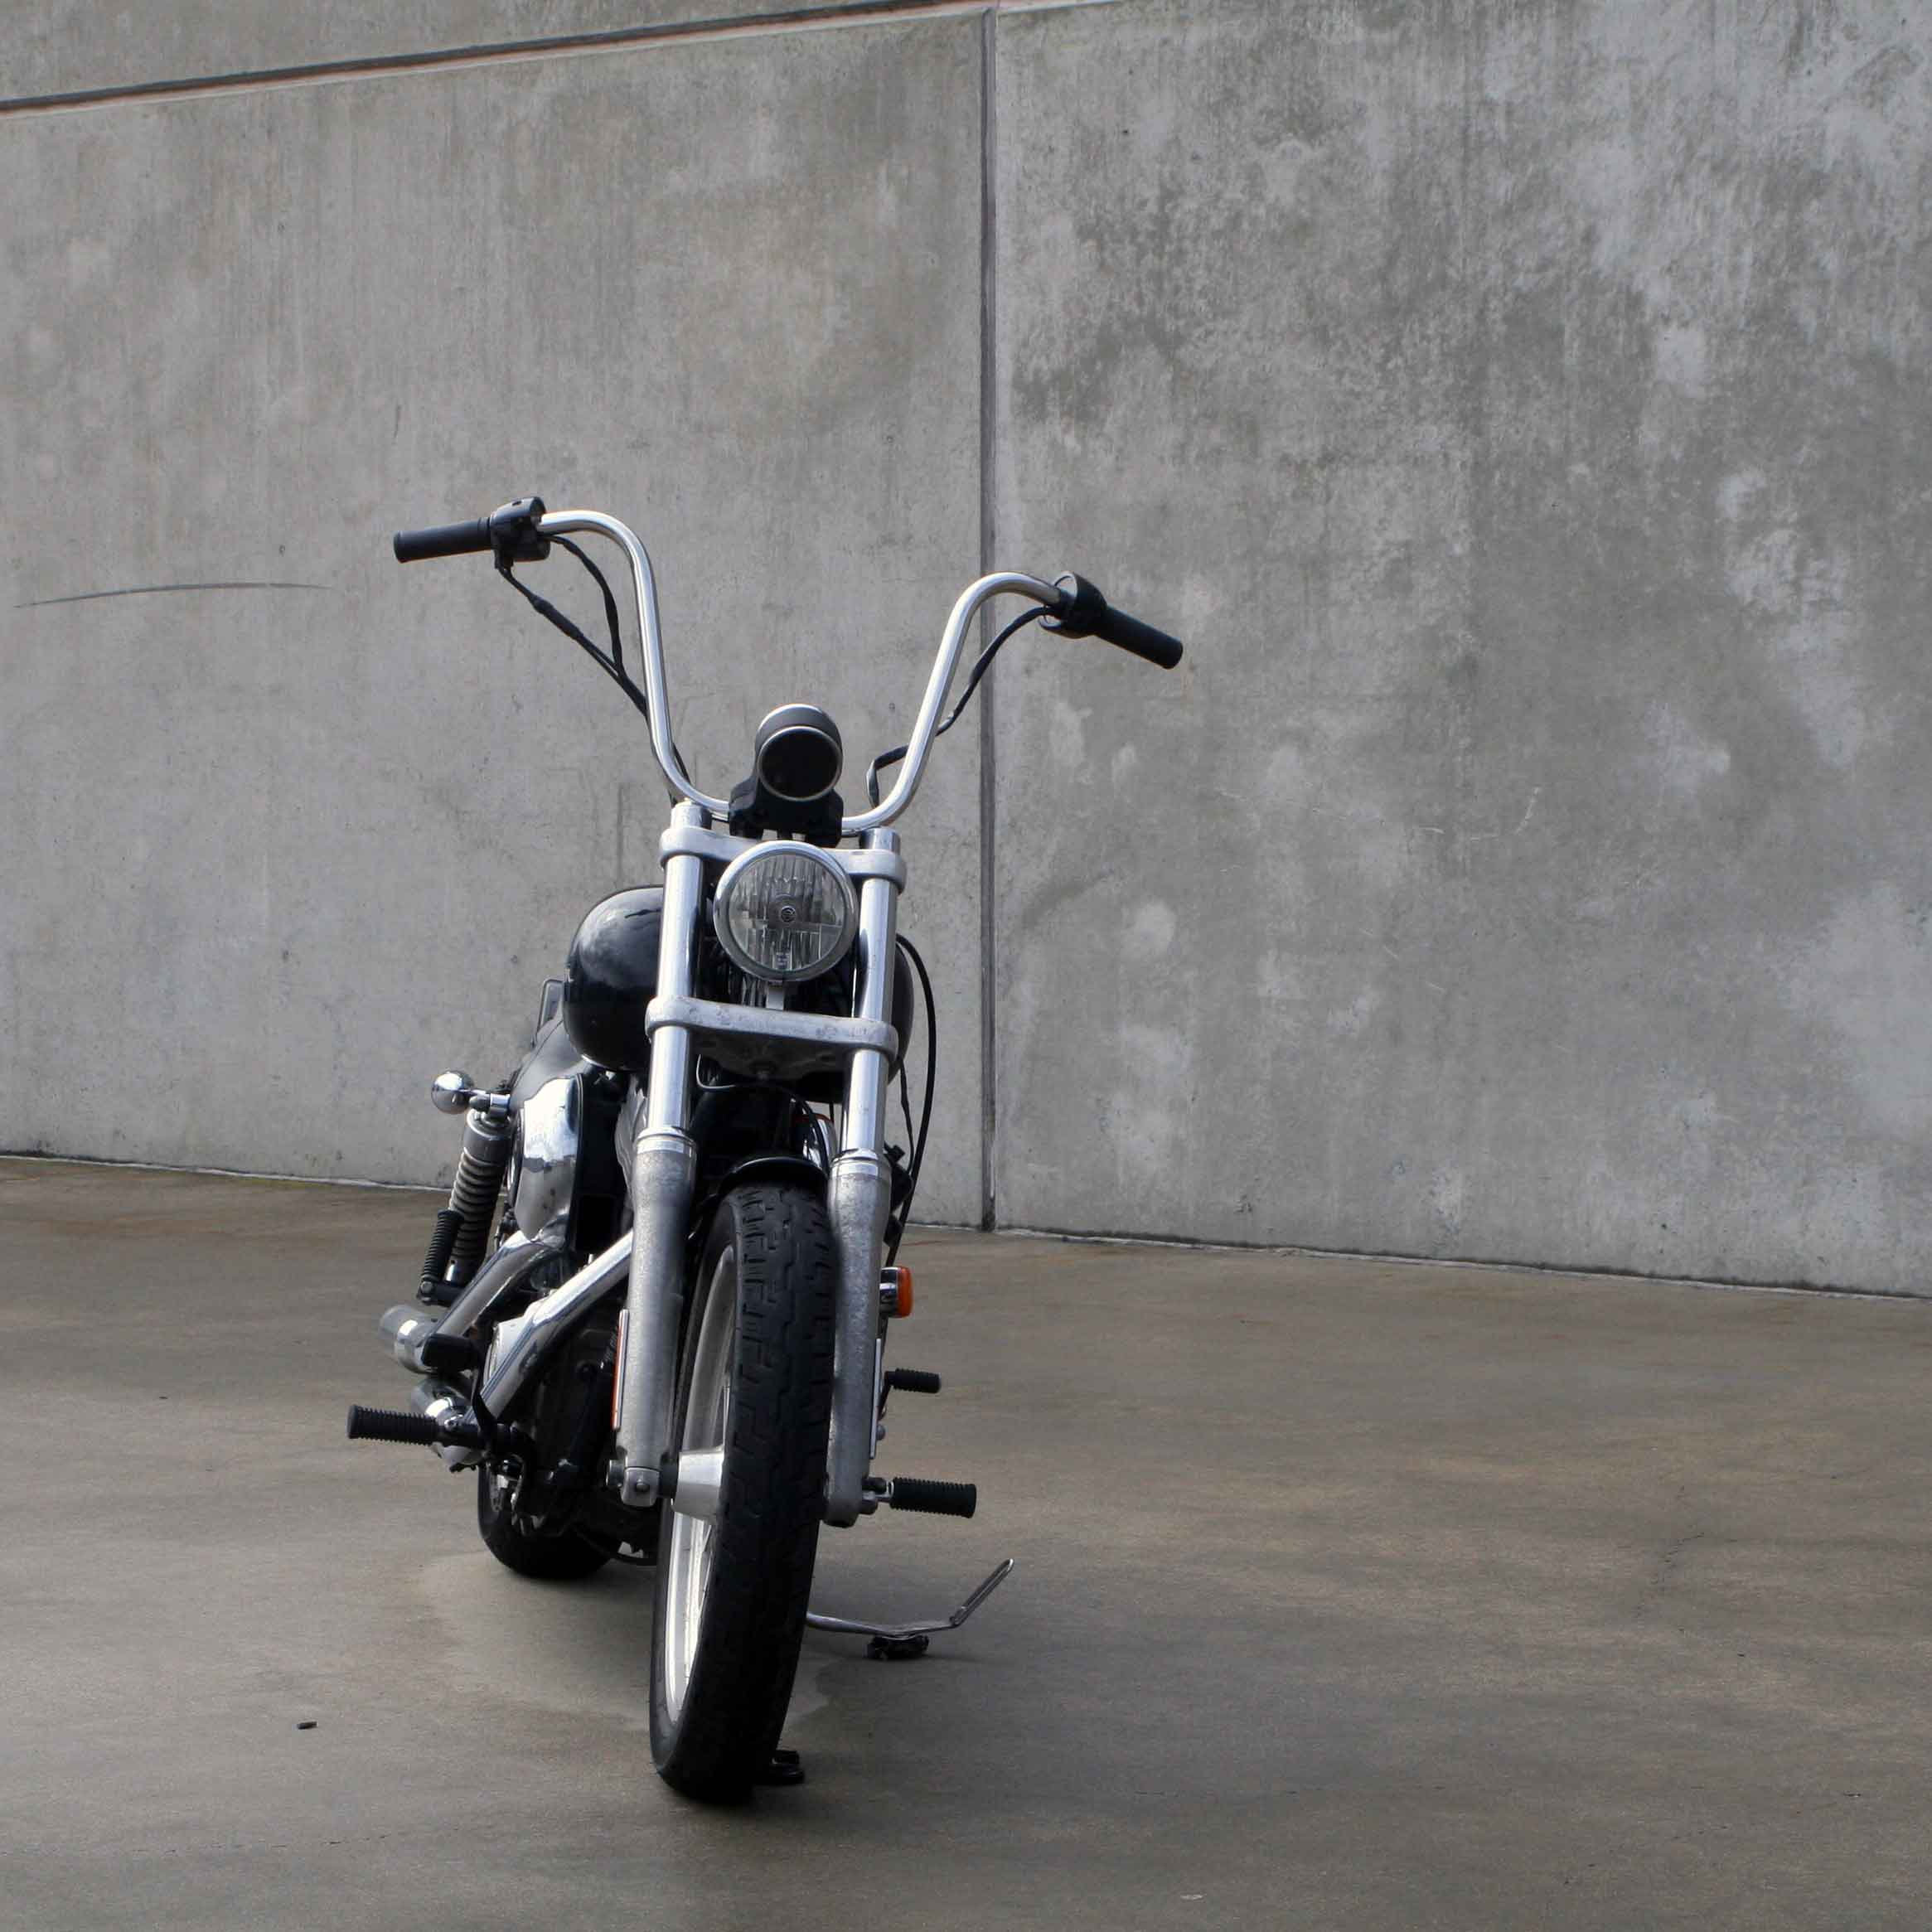 14 Quot Tall Ape Hanger Motorcycle Handlebars 1 Inch